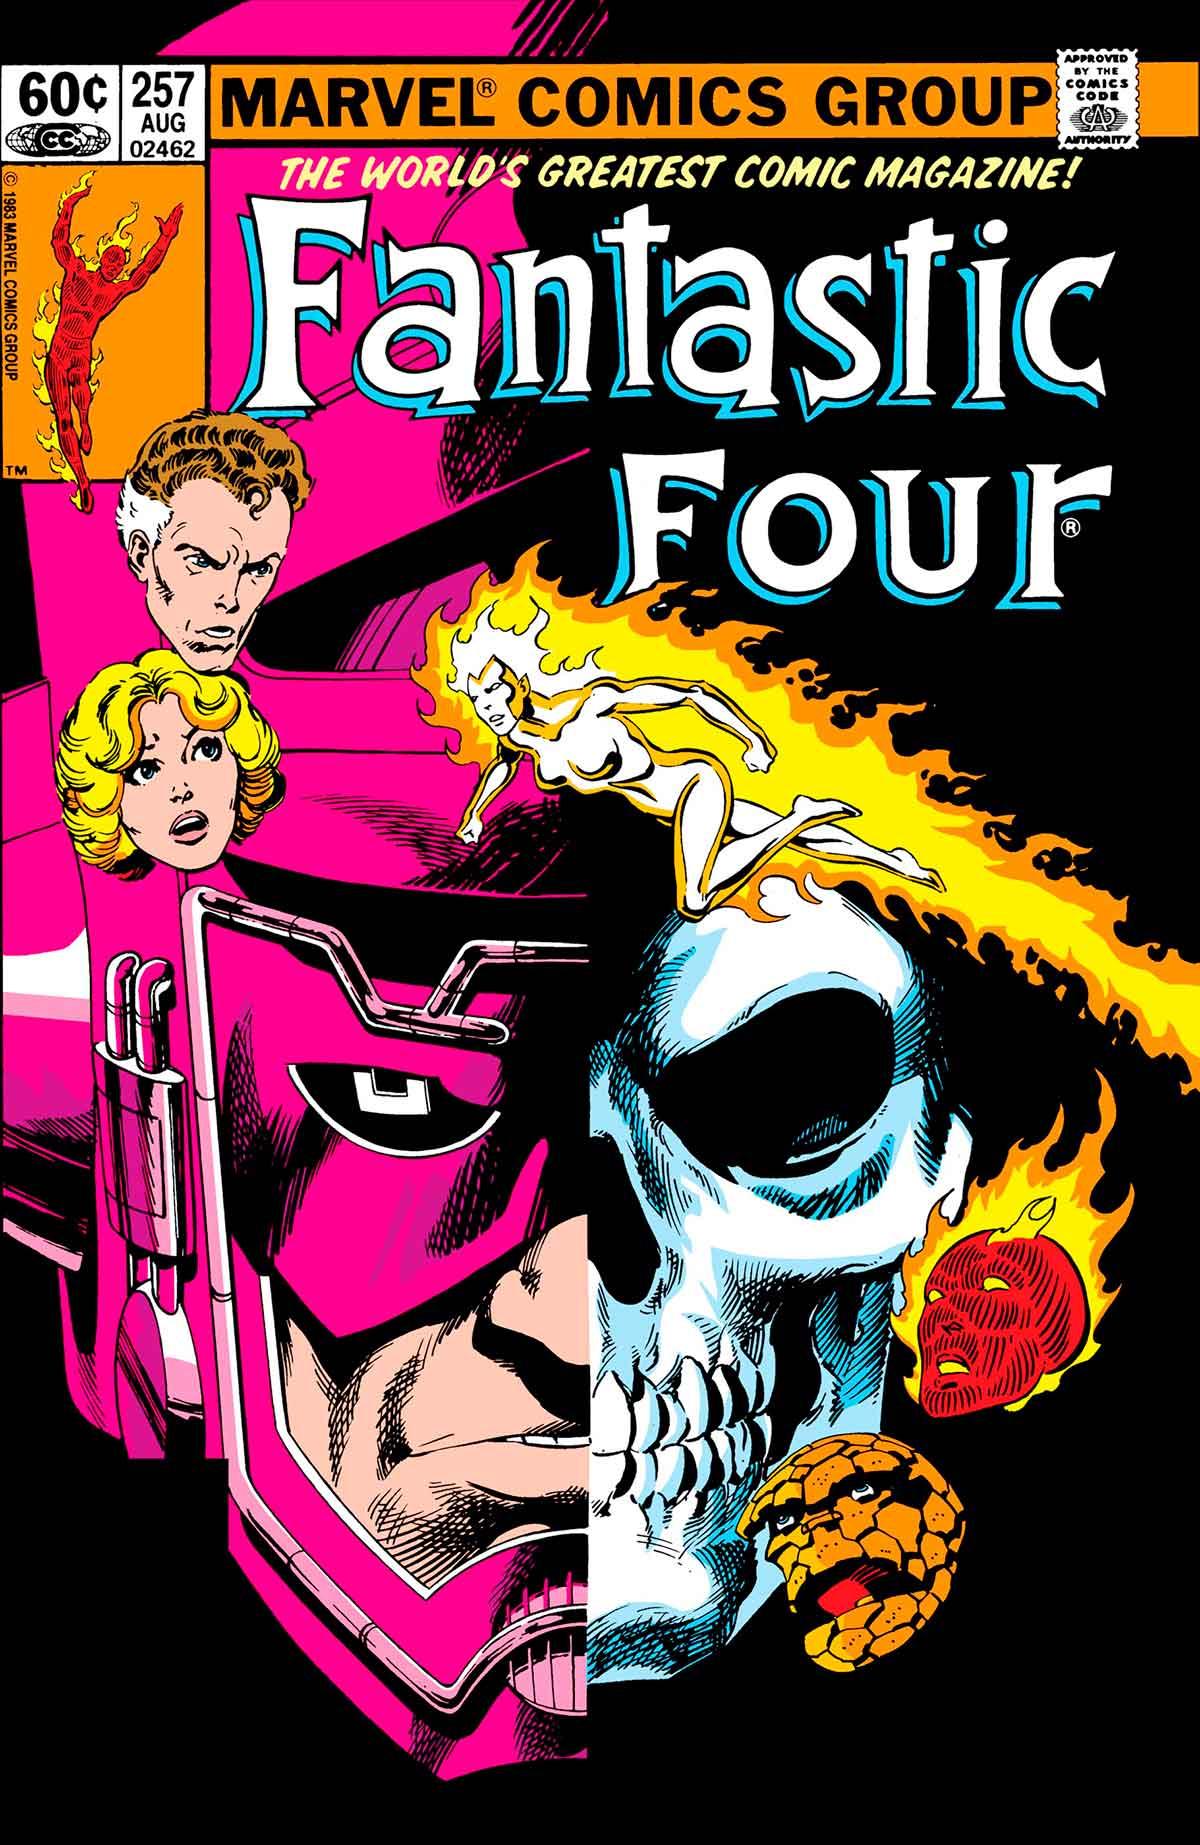 Fantastic Four # 257